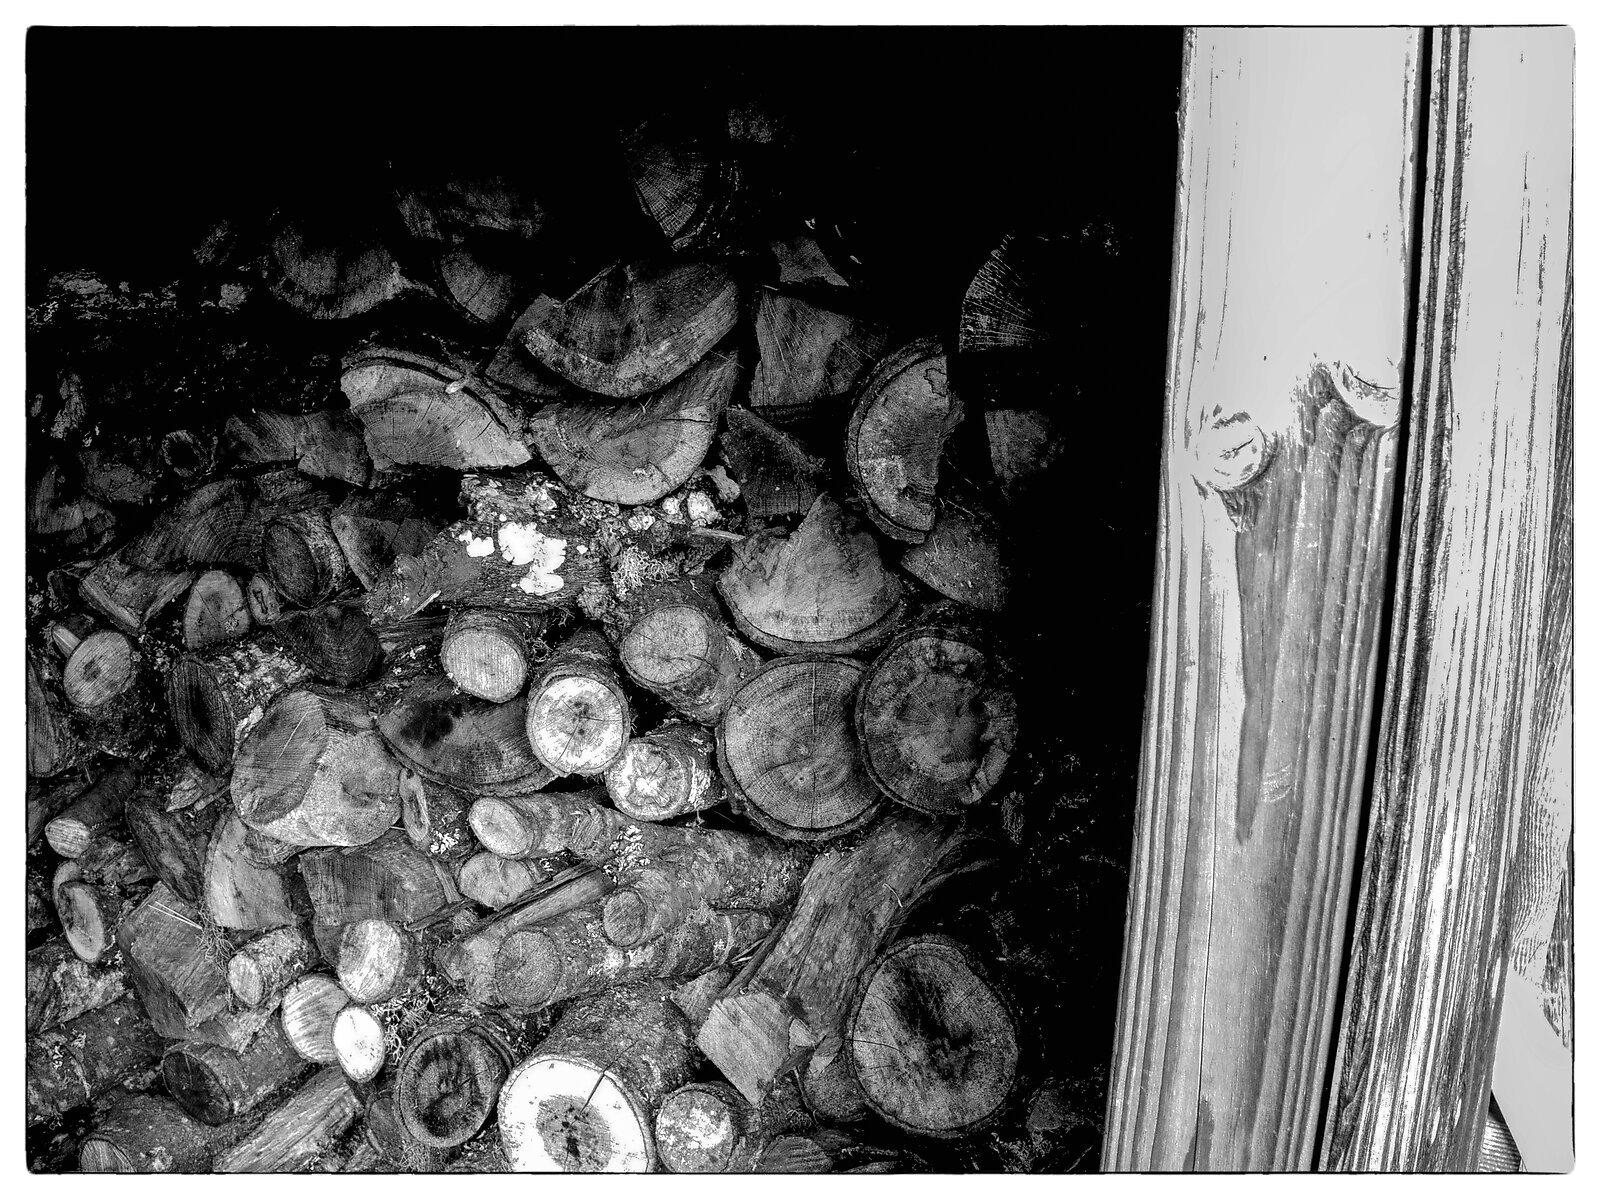 Q7_Mar9_21_wood_shed#1.jpg